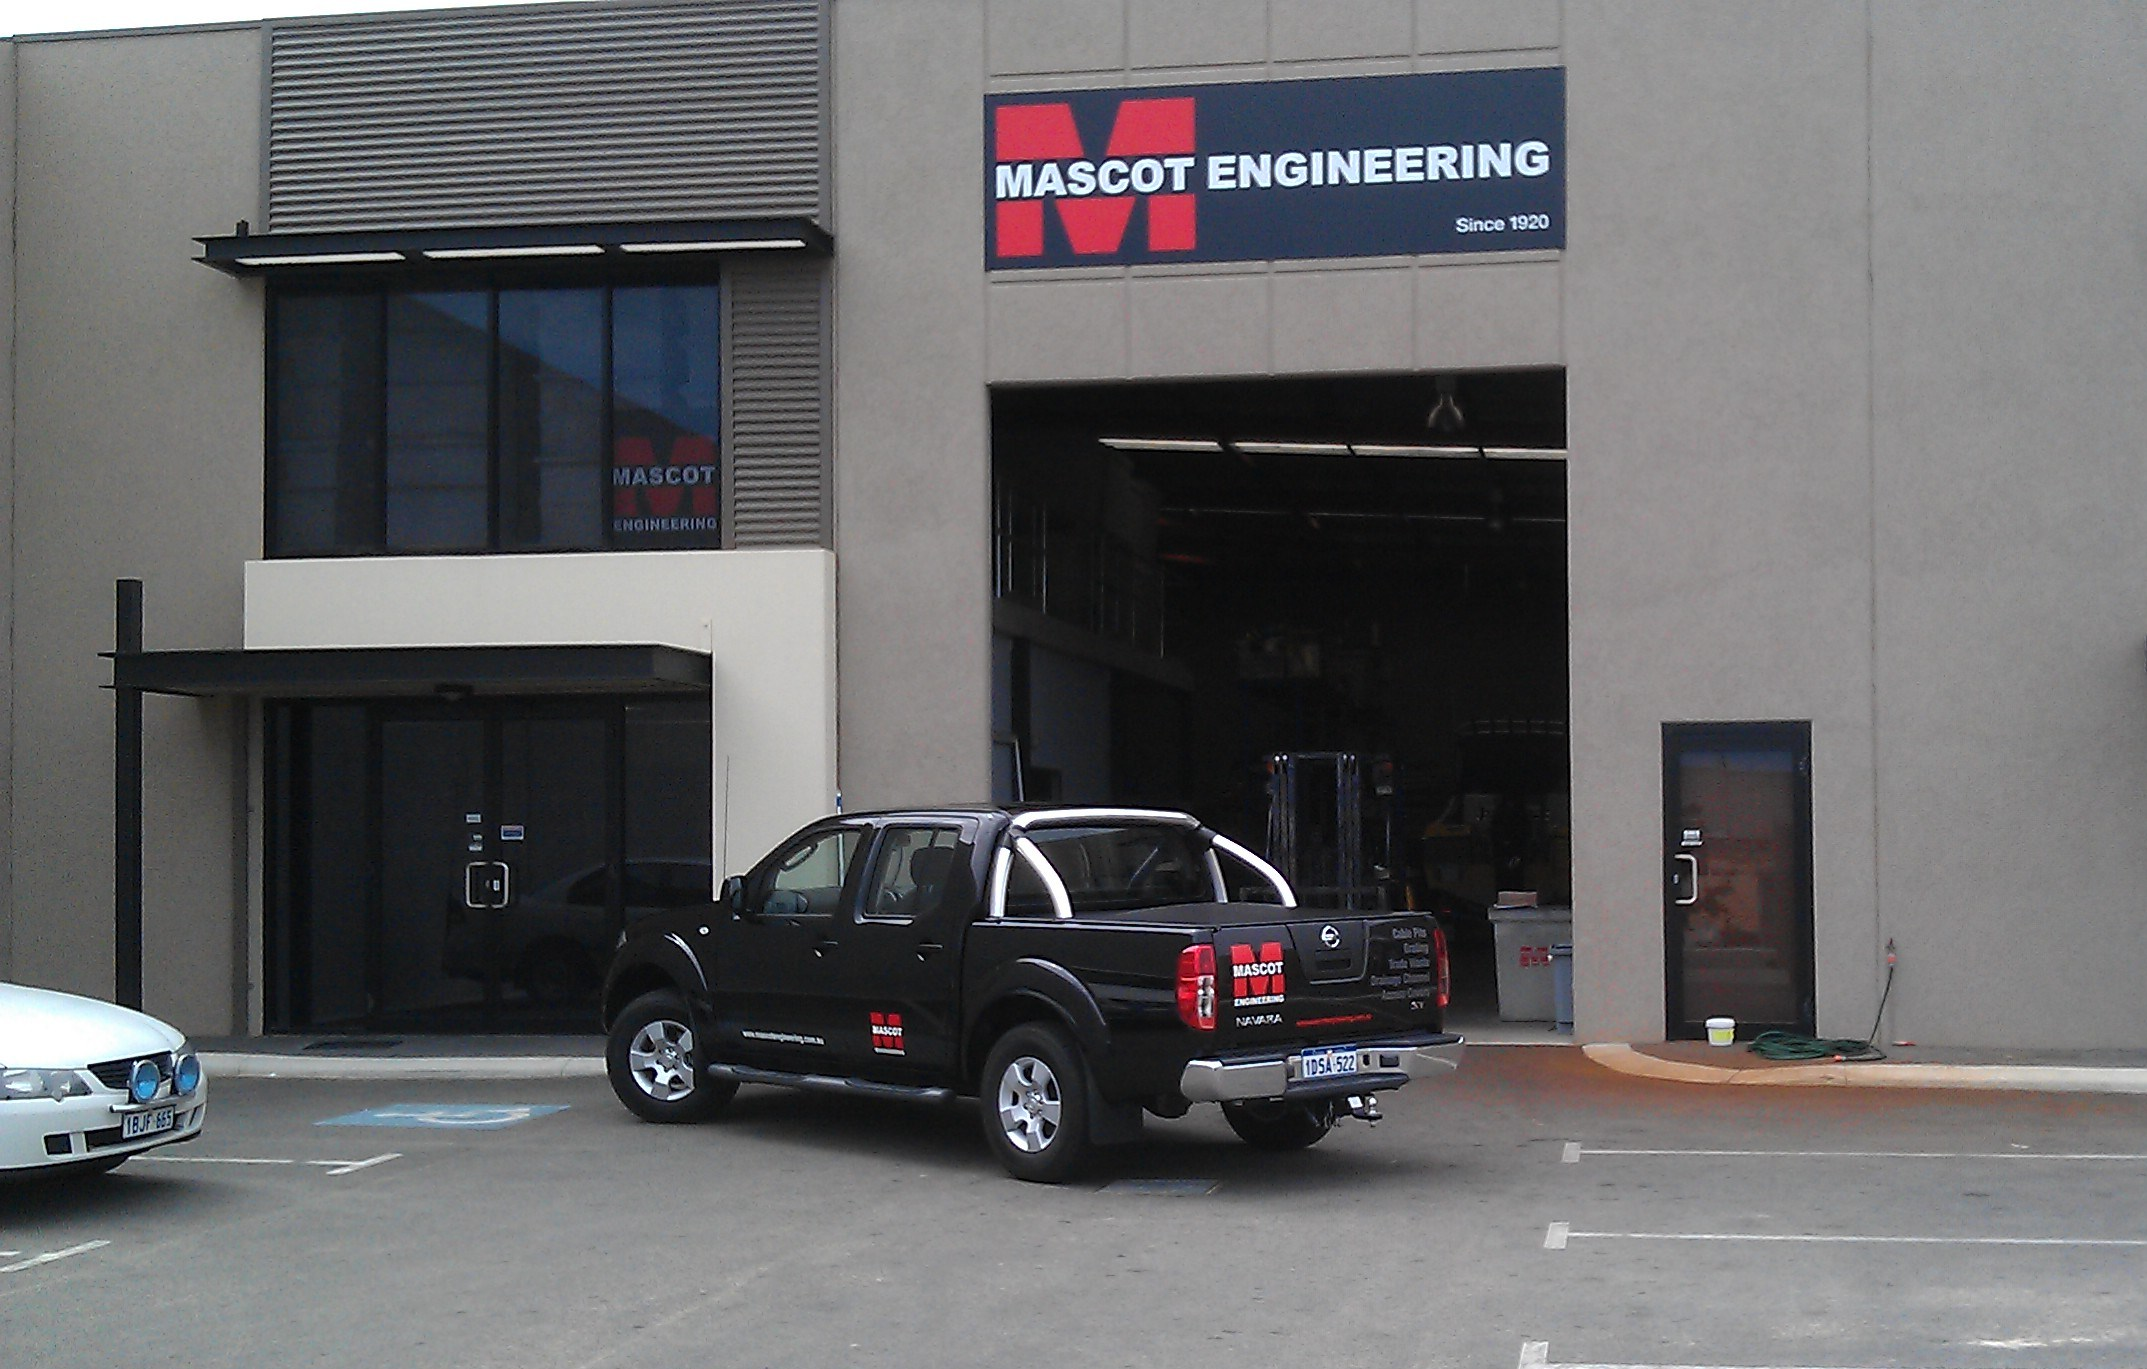 Mascot Engineering Perth